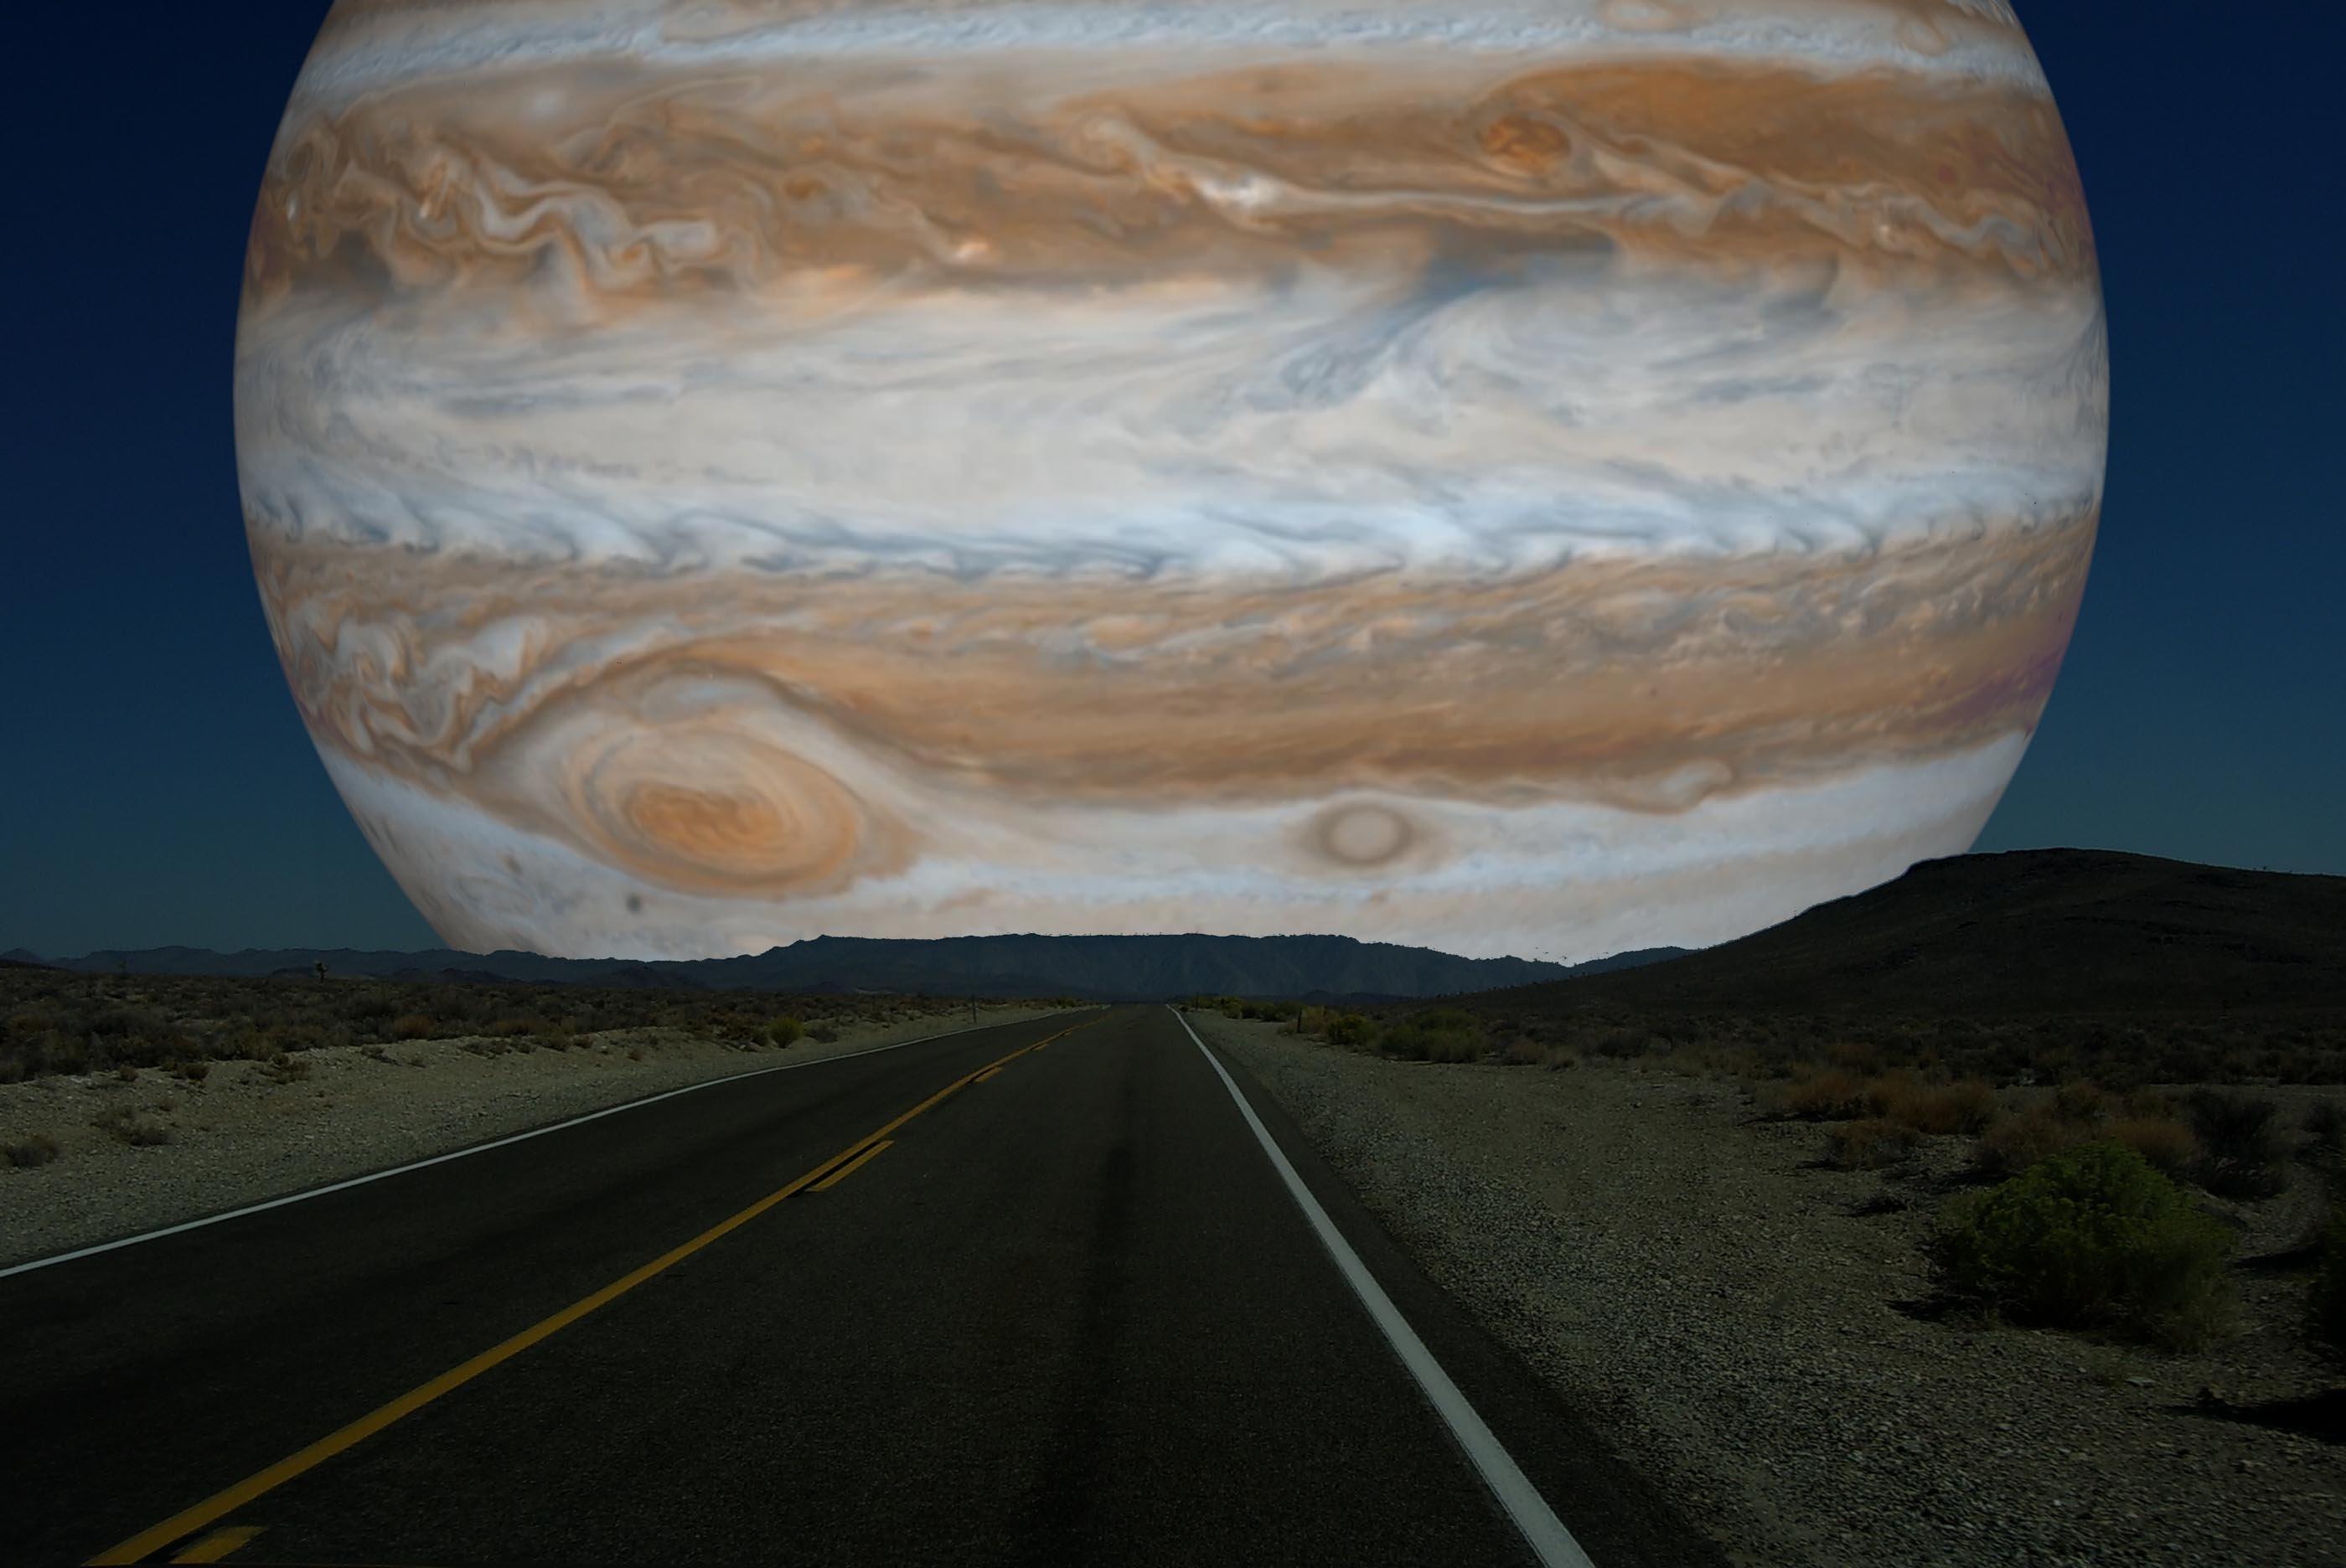 юпитер и земля планета фото ярмарку, люди старались